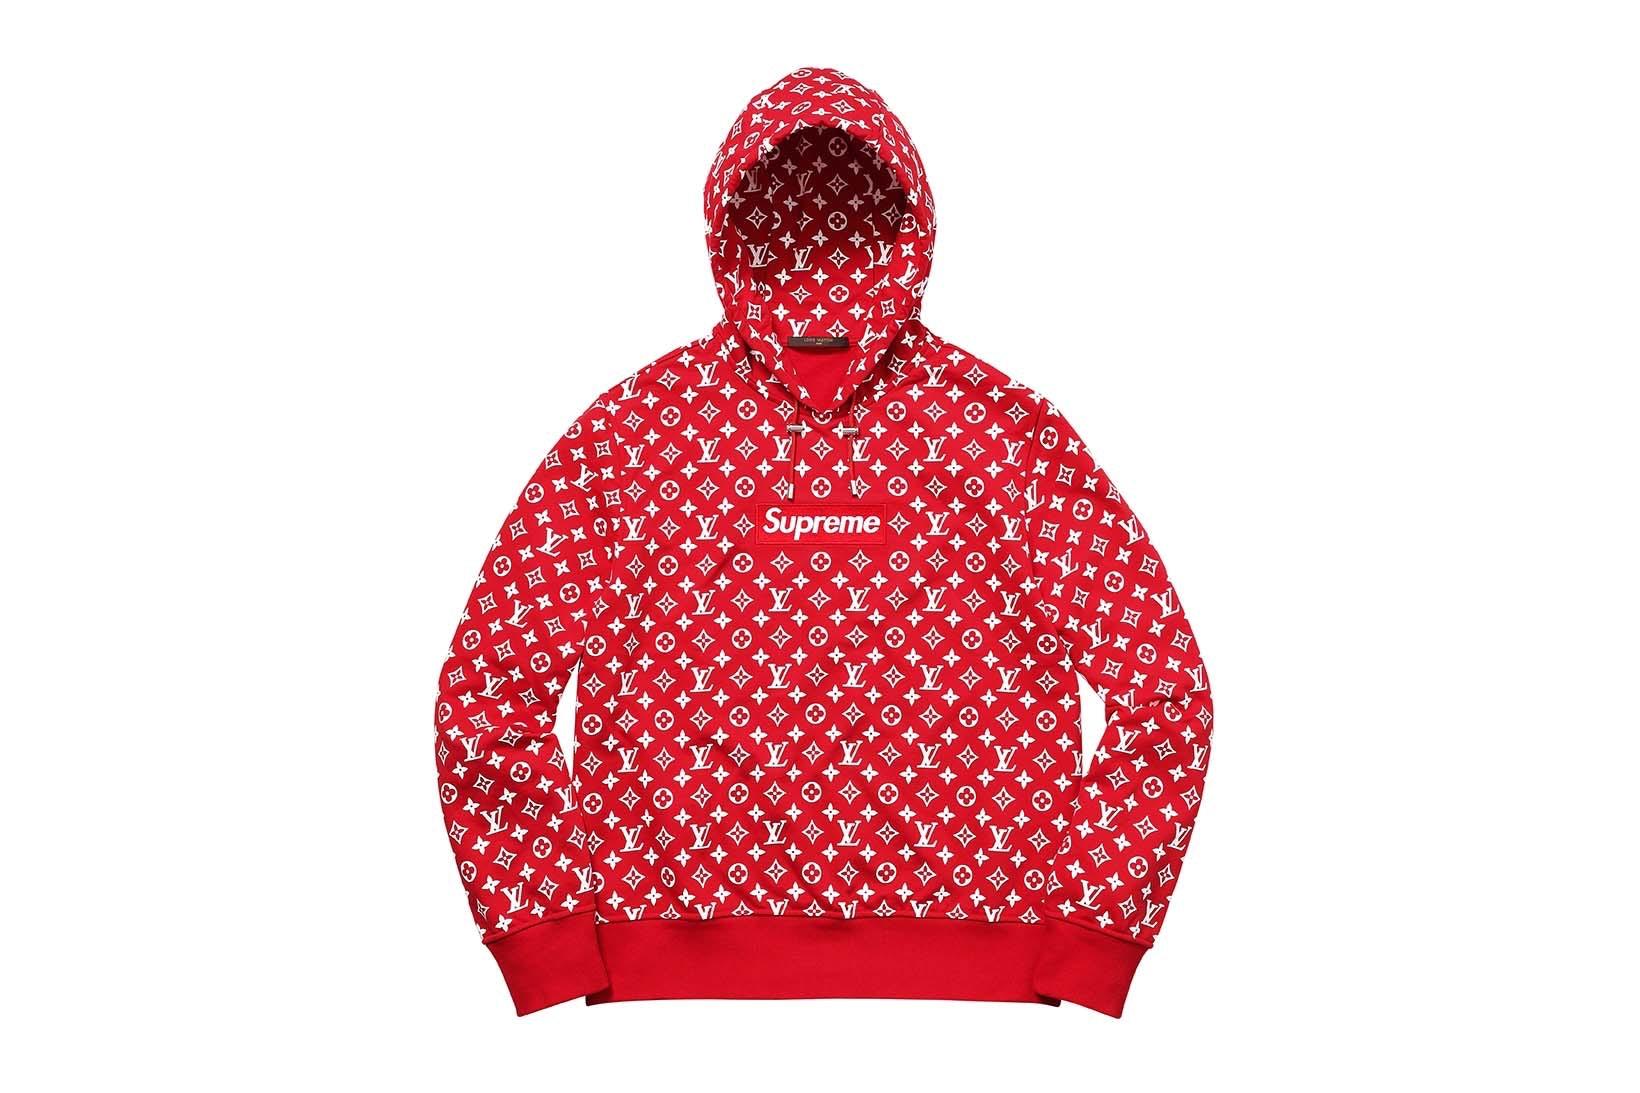 Supreme(シュプリーム)×Louis Vuitton(ルイ・ヴィトン) / ボックス ロゴ フード スウェットシャツ(Box Logo Hooded Sweatshirt)